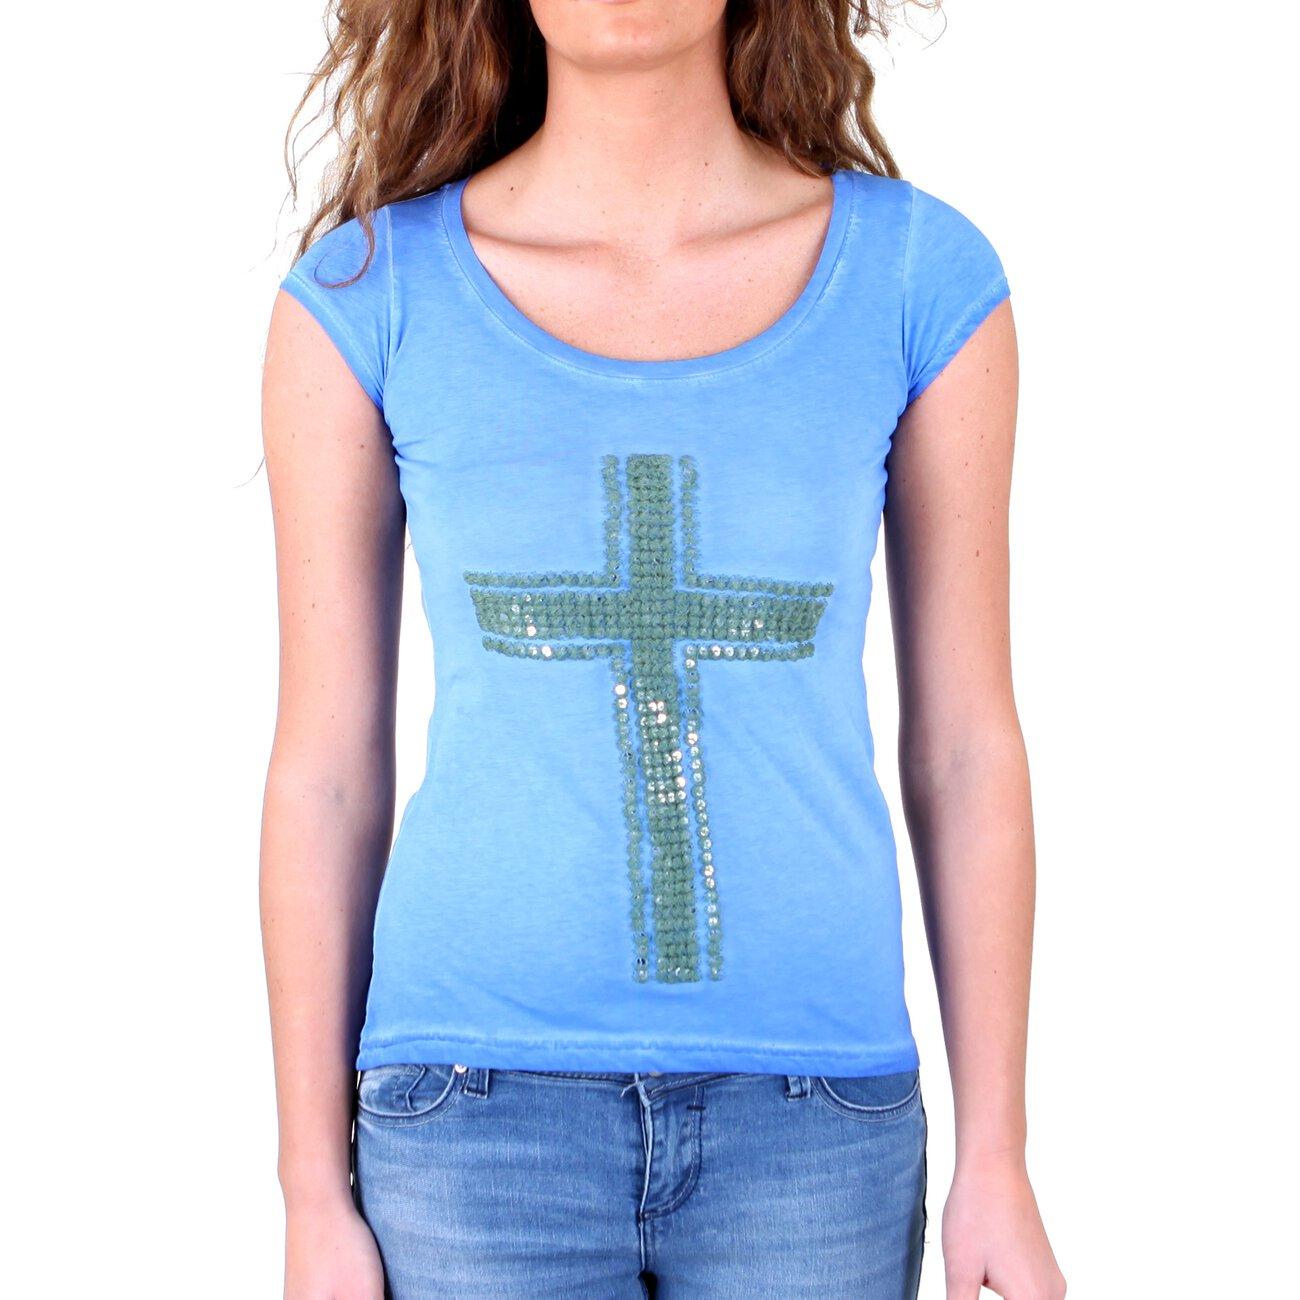 t shirt damen artwork crucifix kreuz shirt g nstig kaufen. Black Bedroom Furniture Sets. Home Design Ideas